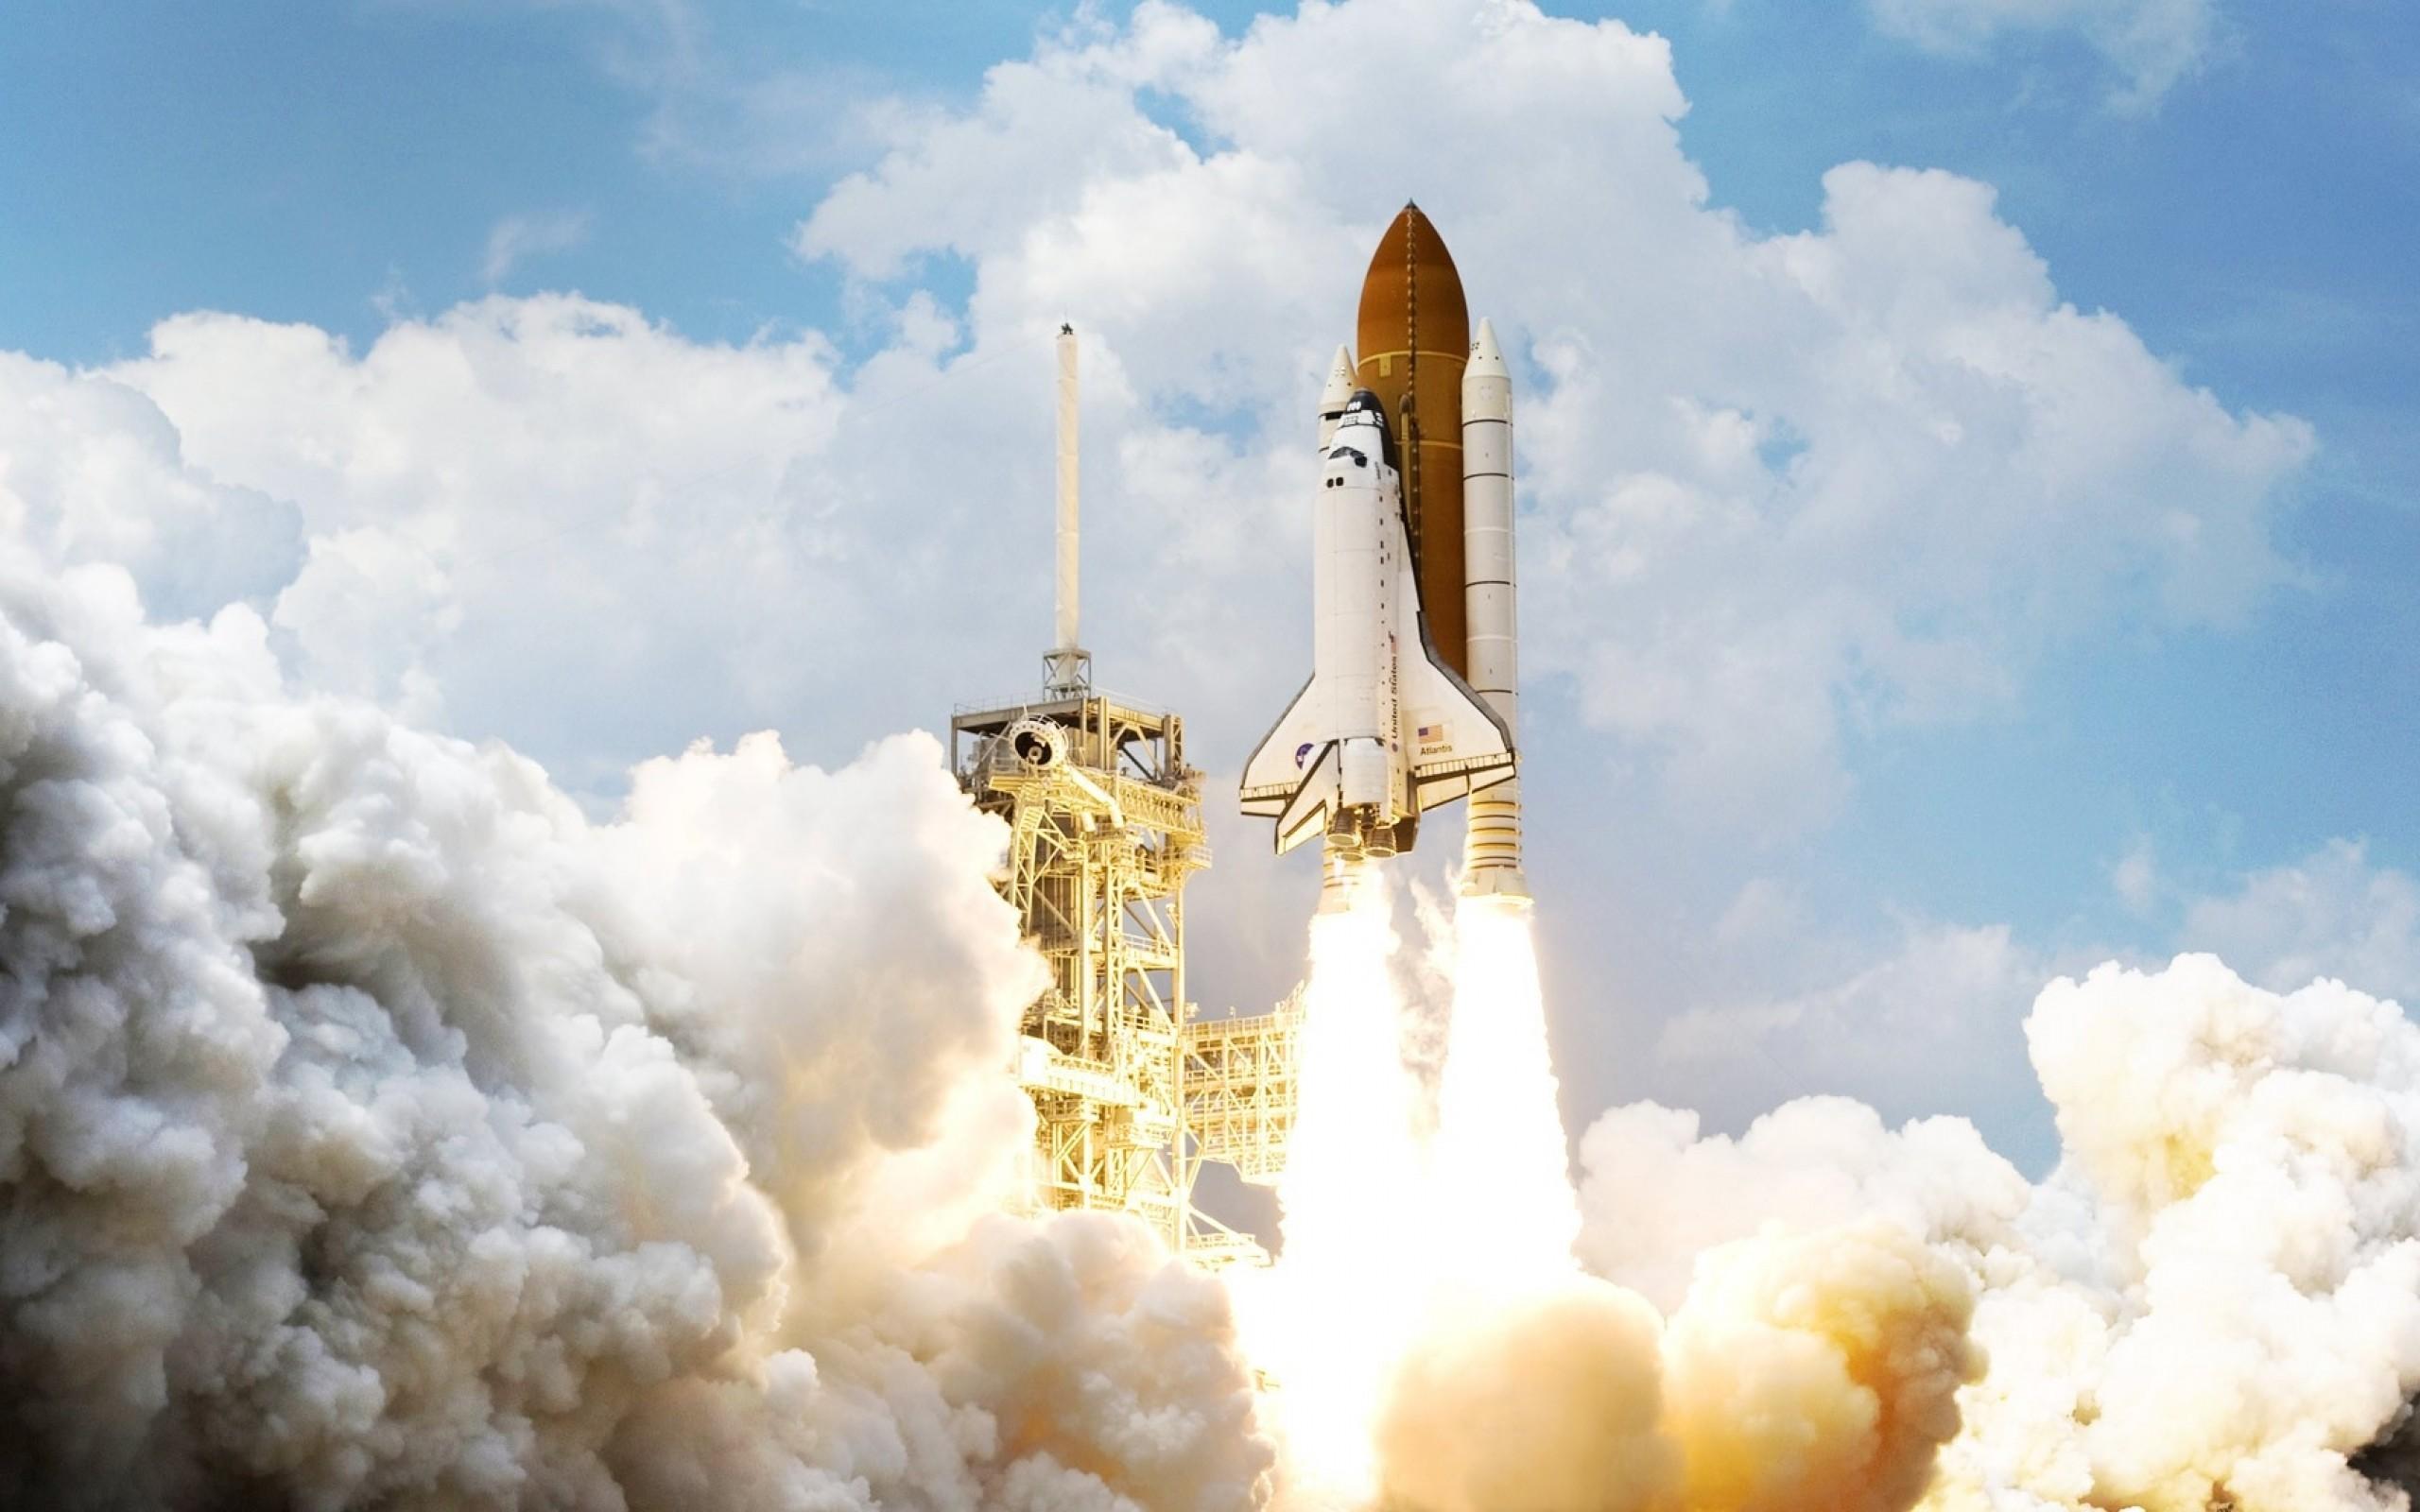 Nasa Iphone 5 Wallpaper Rocket Launch Wallpaper 59 Images